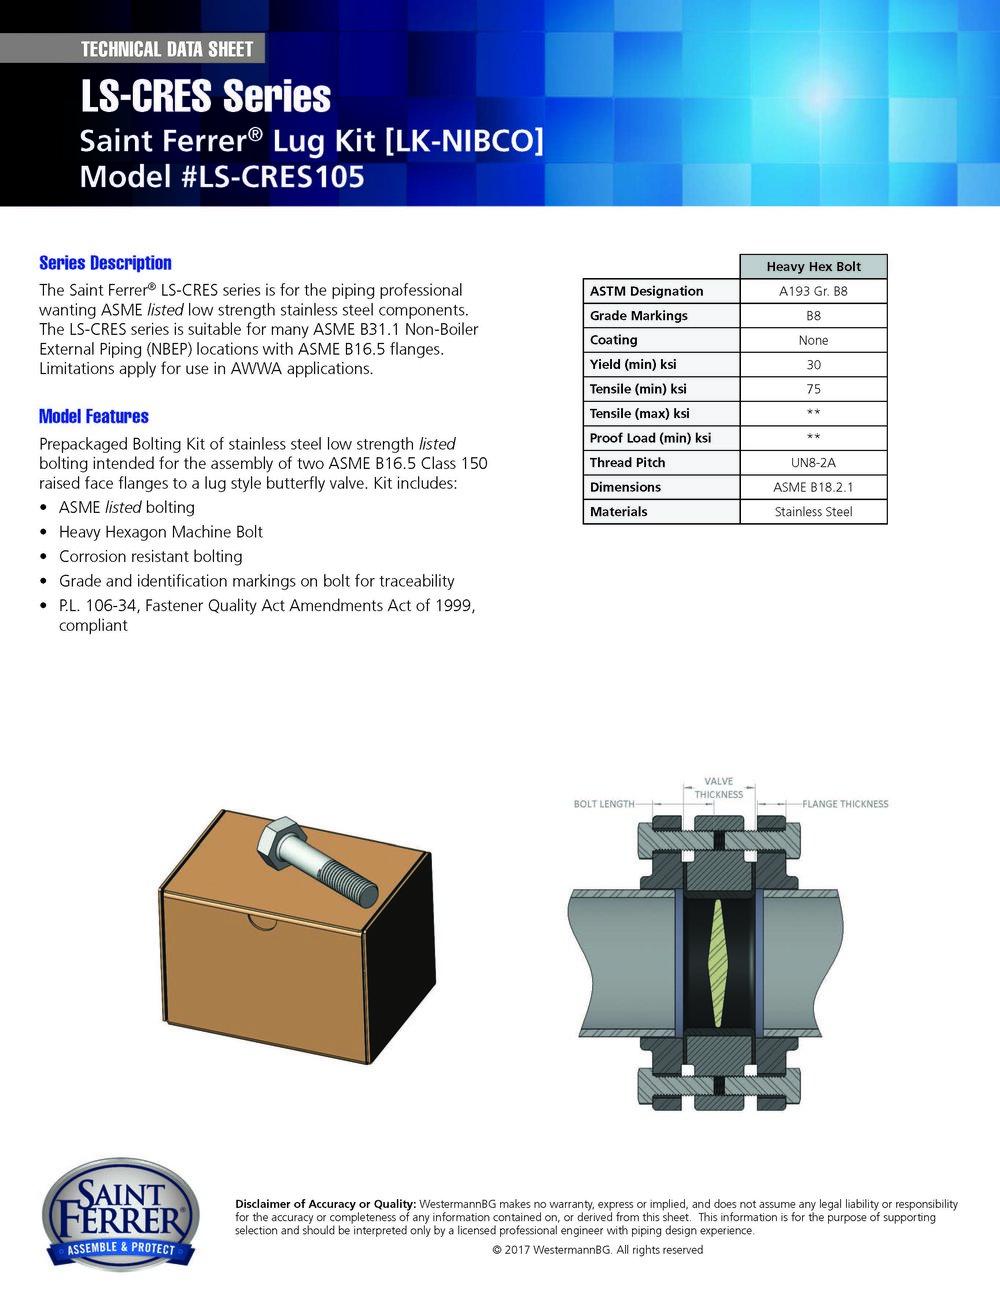 SF_Data_Sheet_LS-CRES_Series_LS-CRES105.jpg